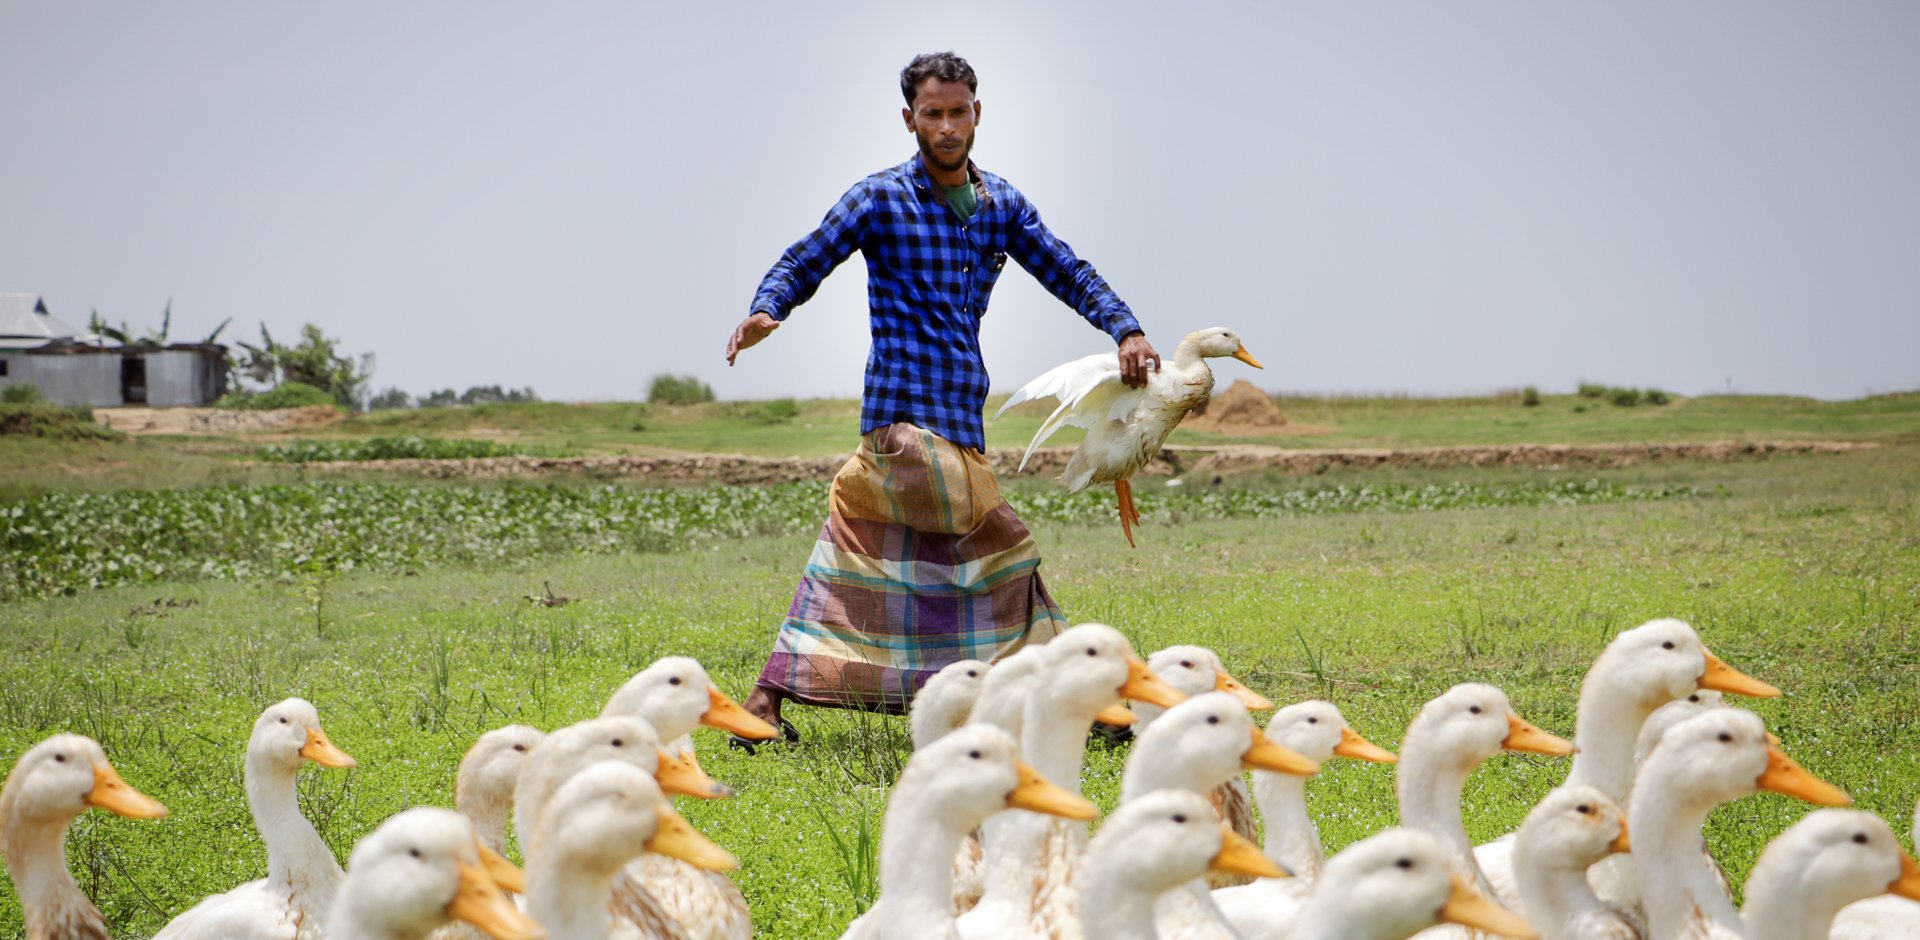 Bangladesh Farmers Are Raising Ducks to Adapt to Climate